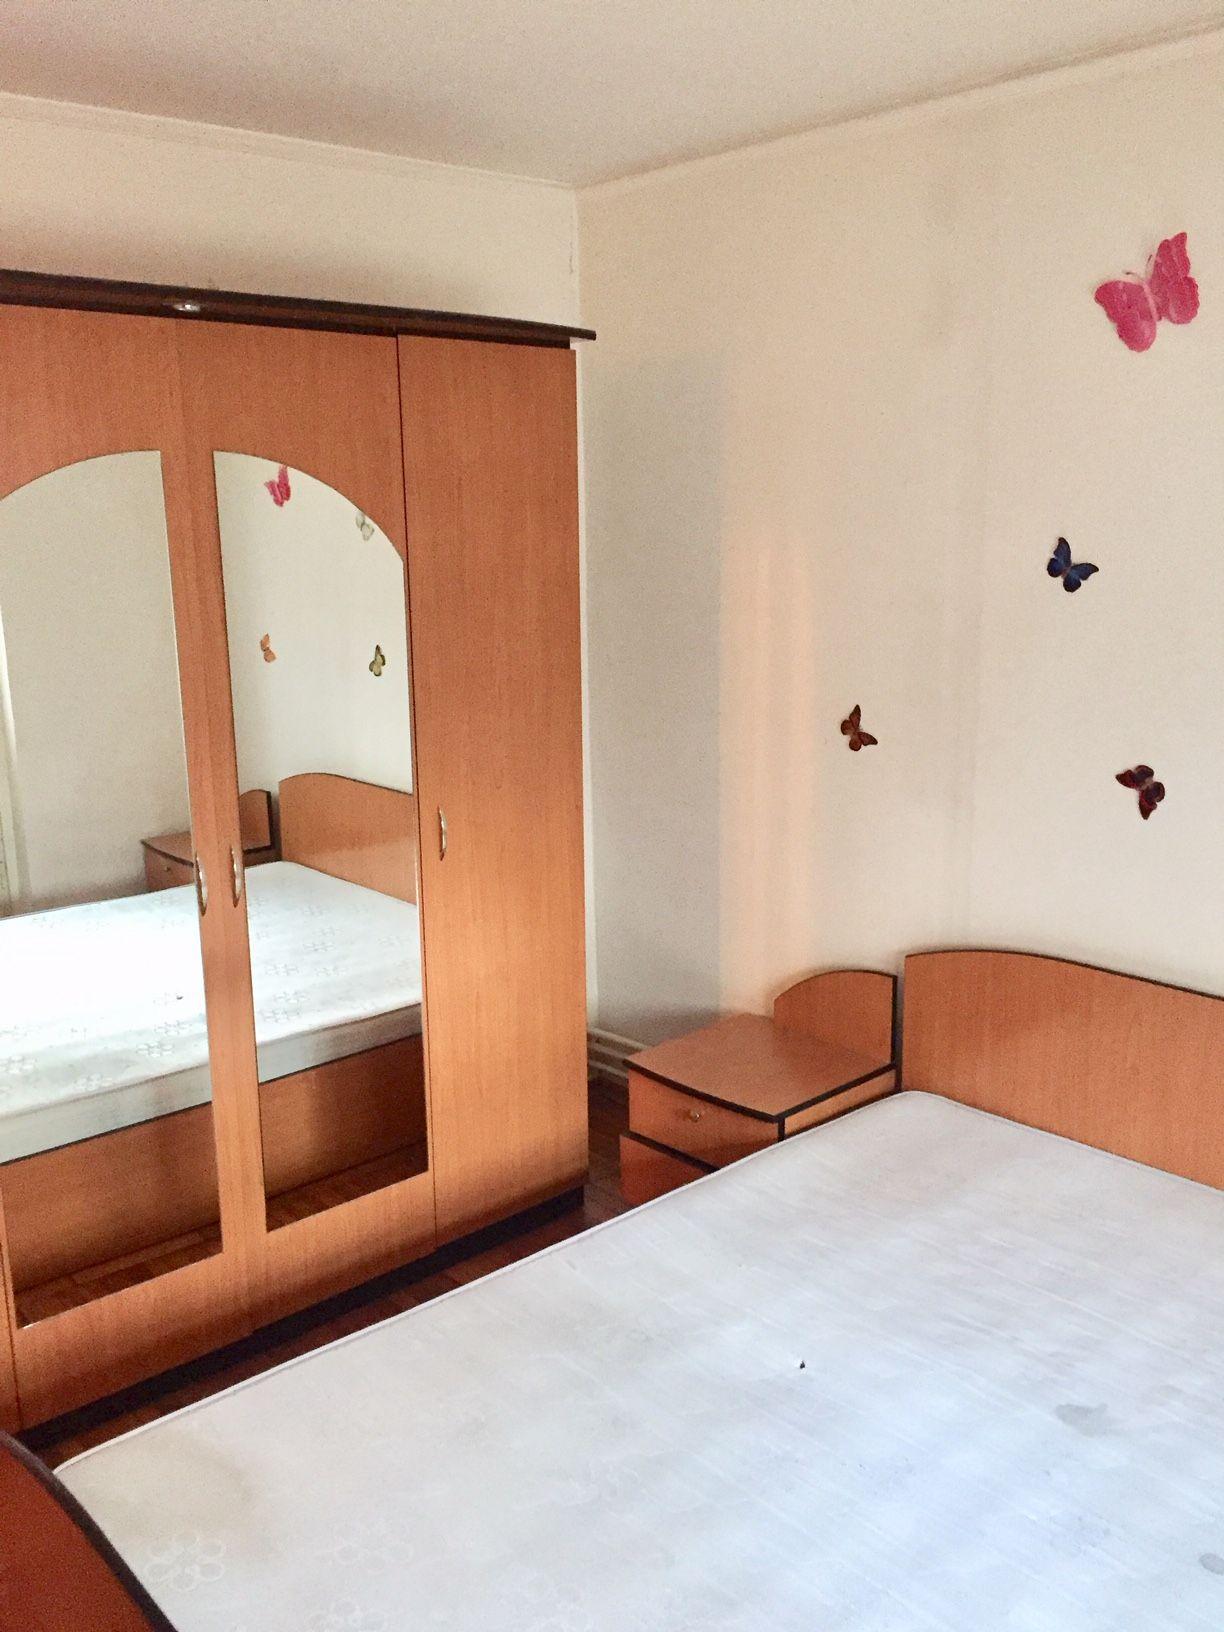 Inchiriere Apartament 2 camere - TOMIS NORD, Constanta